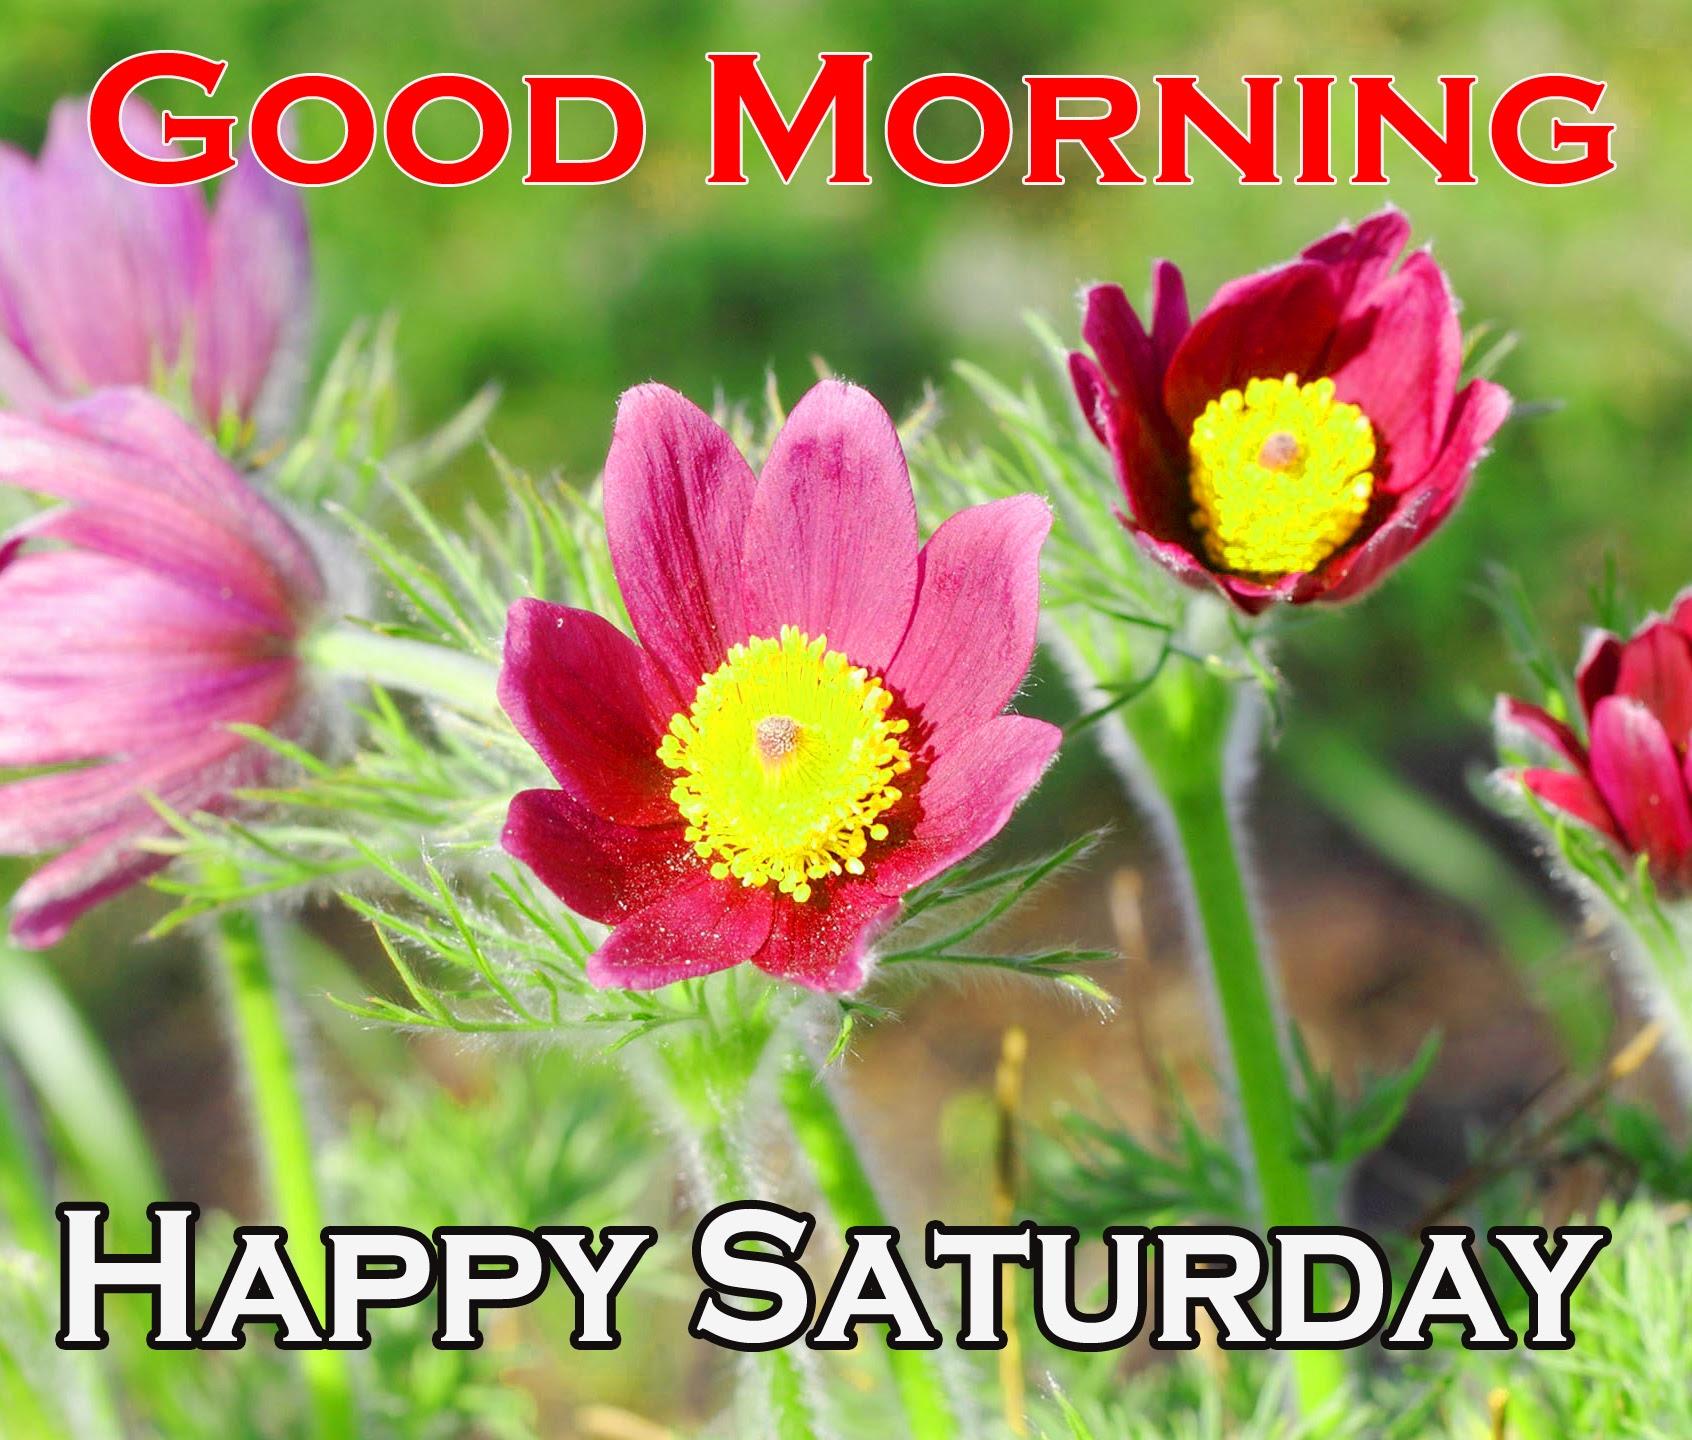 Saturday Good Morning Images 10